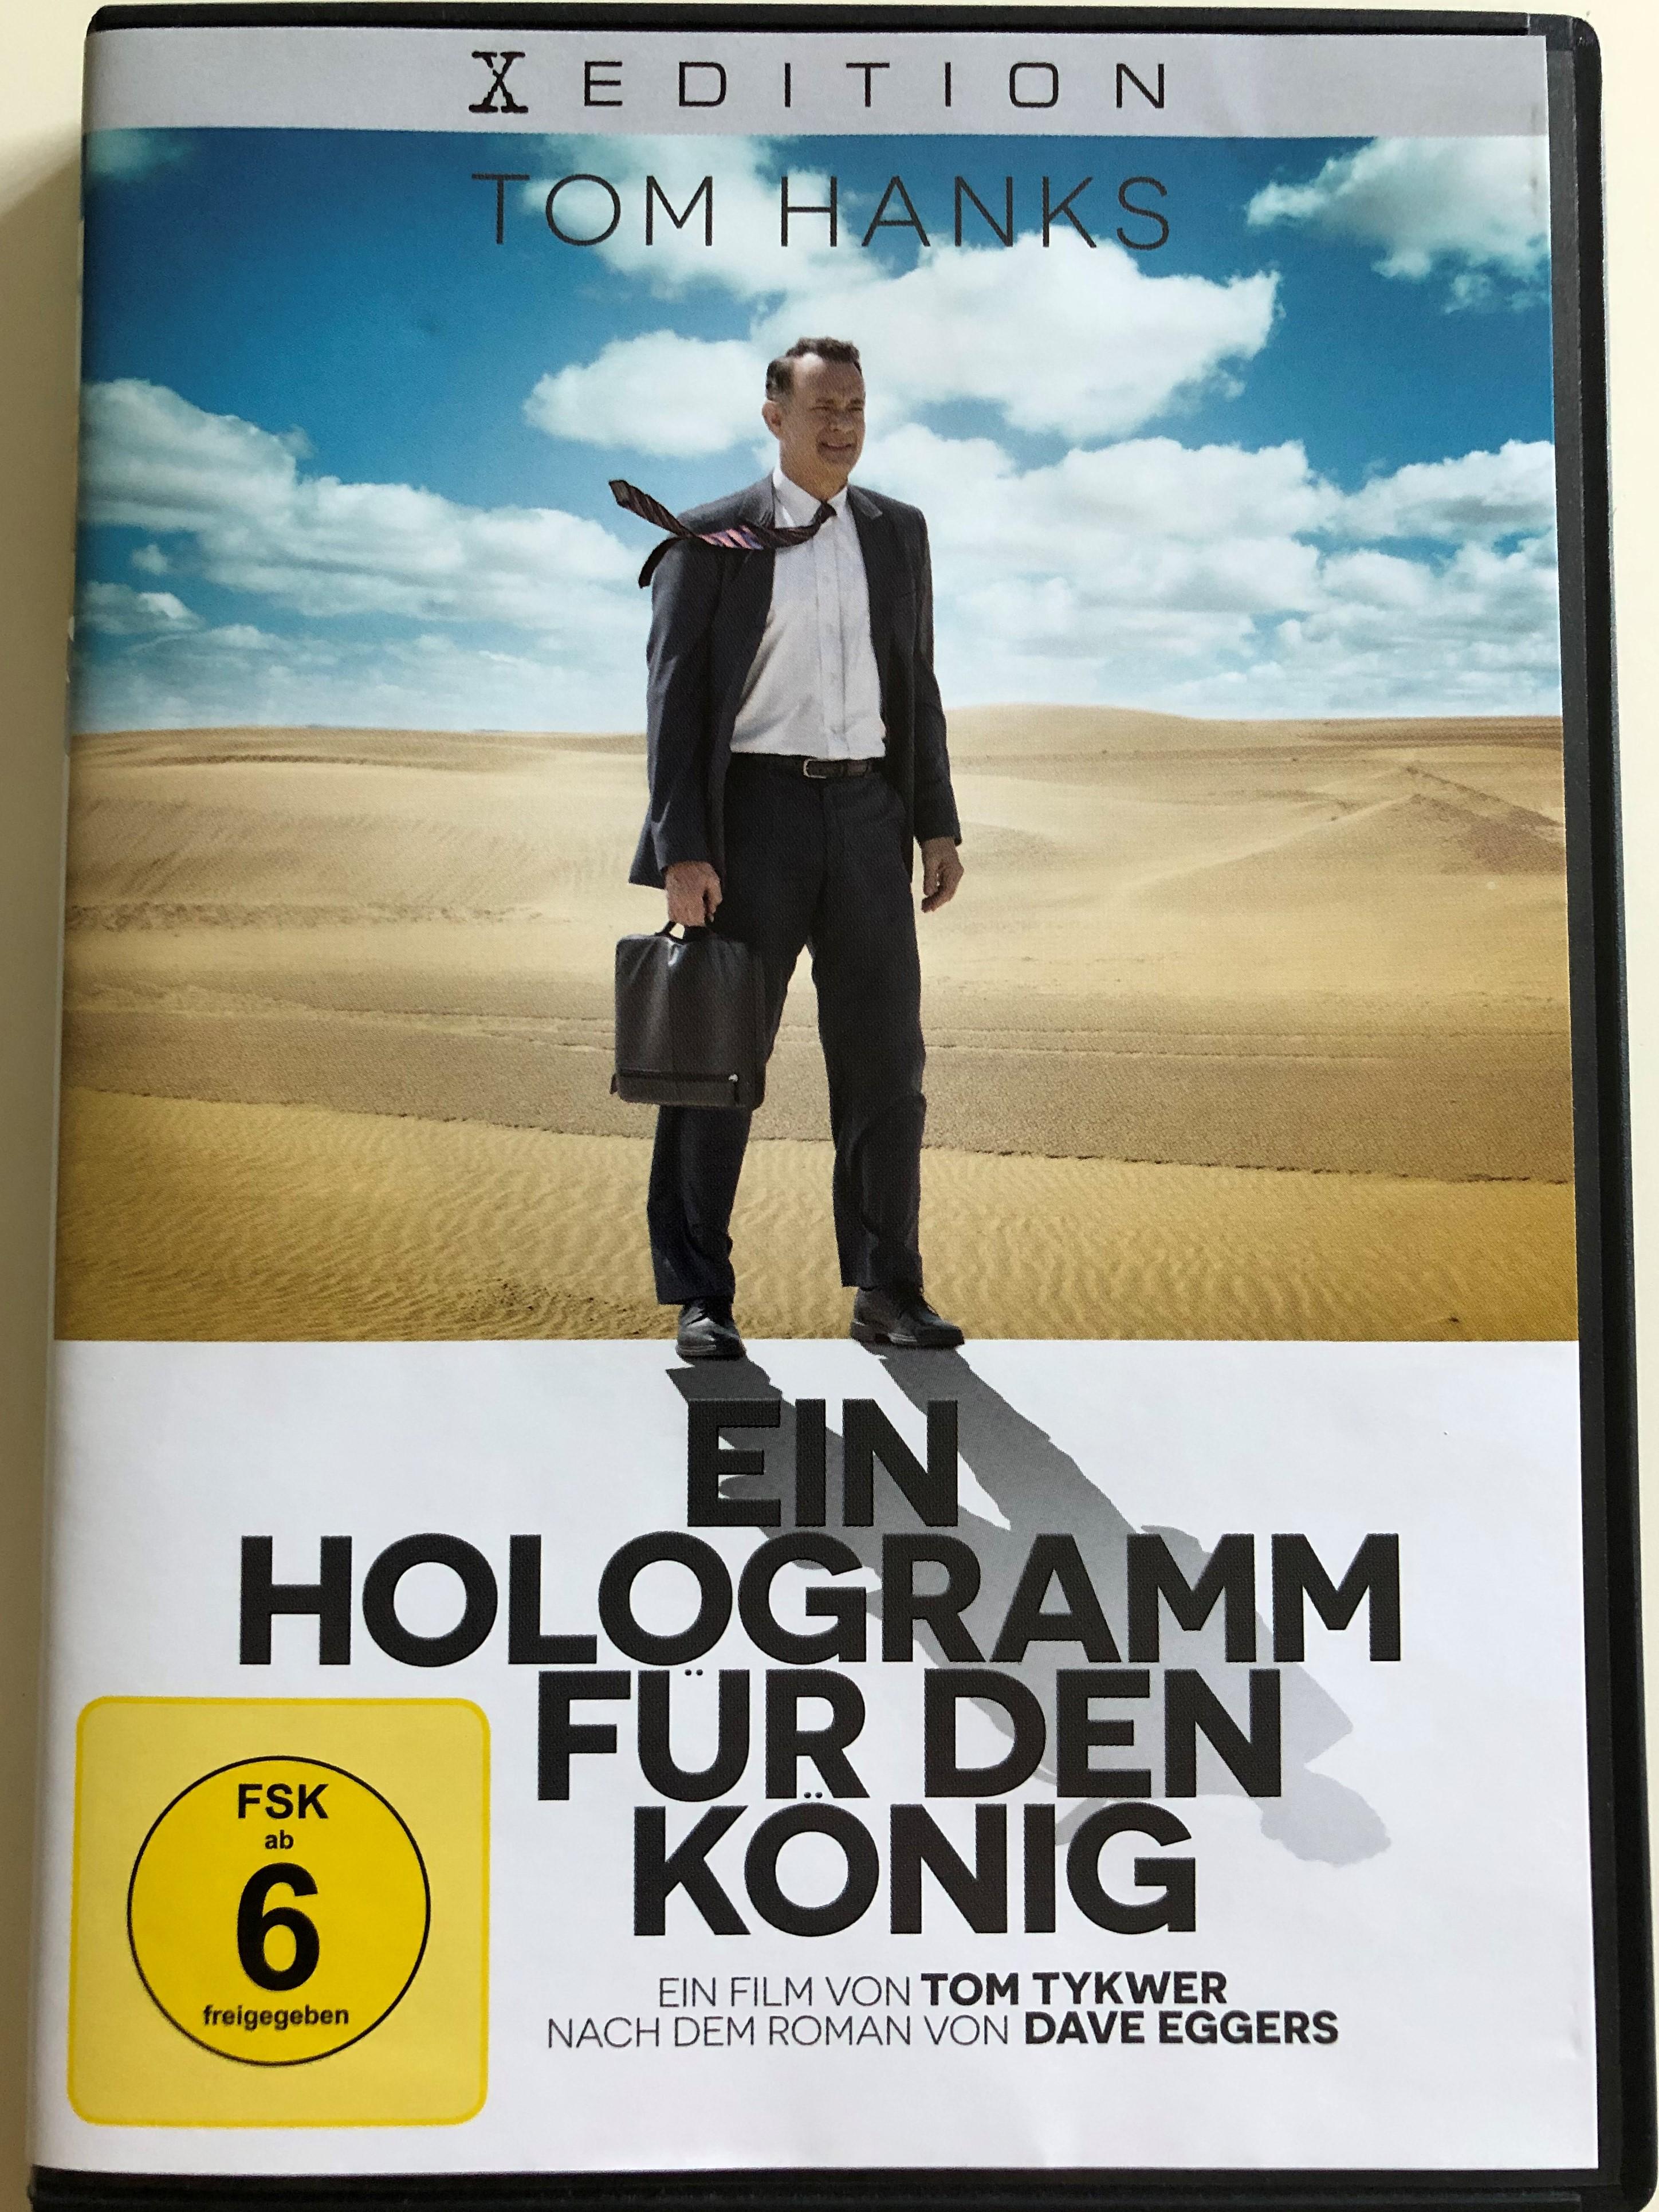 a-hologram-for-the-king-dvd-2016-ein-hologram-f-r-den-k-nig-directed-by-tom-tykwer-starring-tom-hanks-alexander-black-sarita-choudhury-sidse-babett-knudsen-1-.jpg